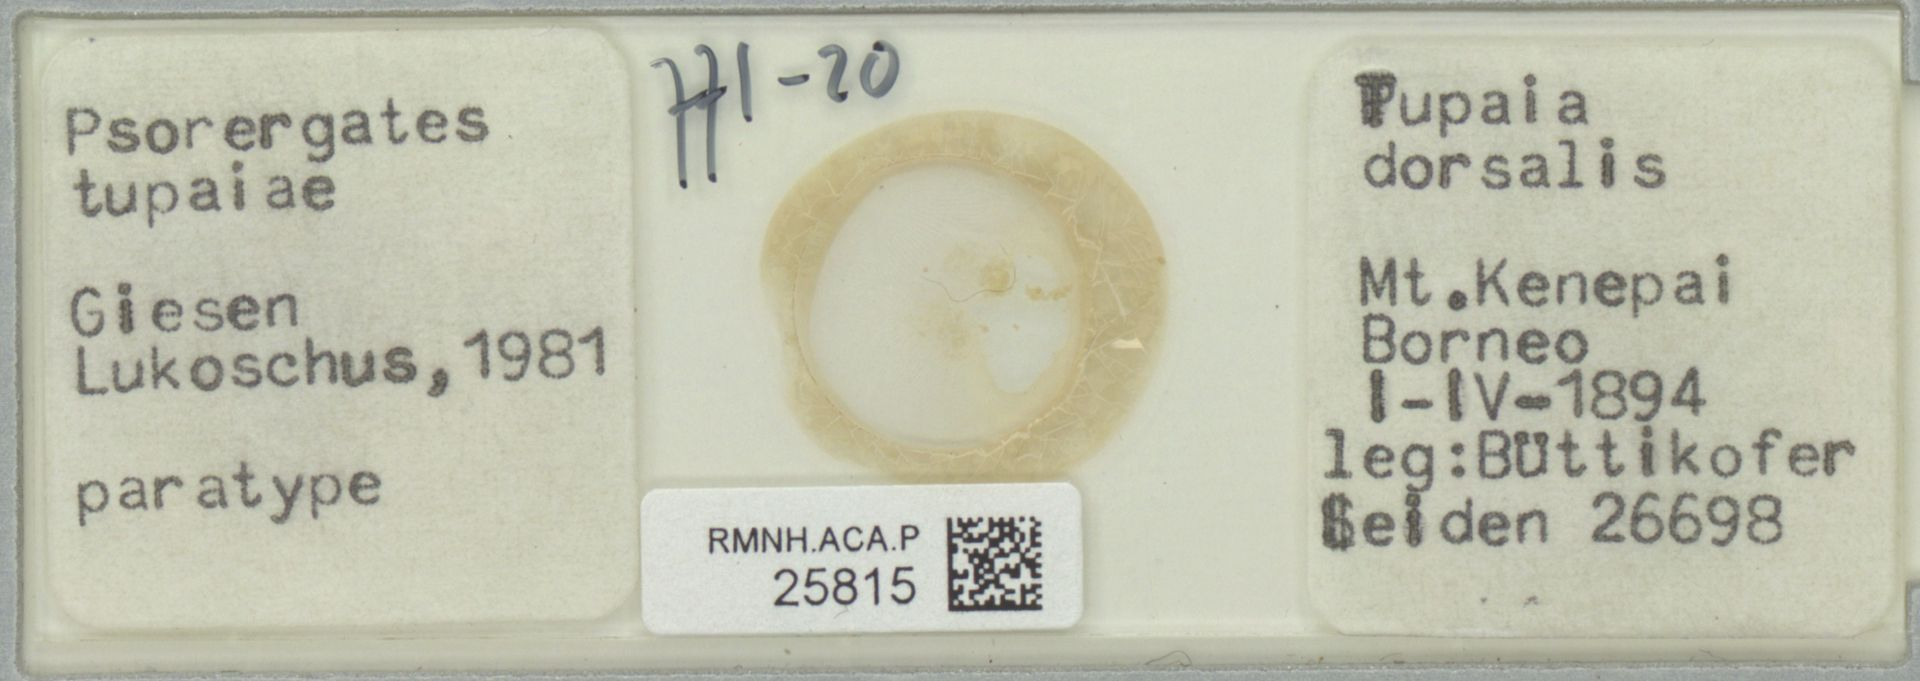 RMNH.ACA.P.25815 | Psorergates tupaiea Giesen, Lukoschus 1981